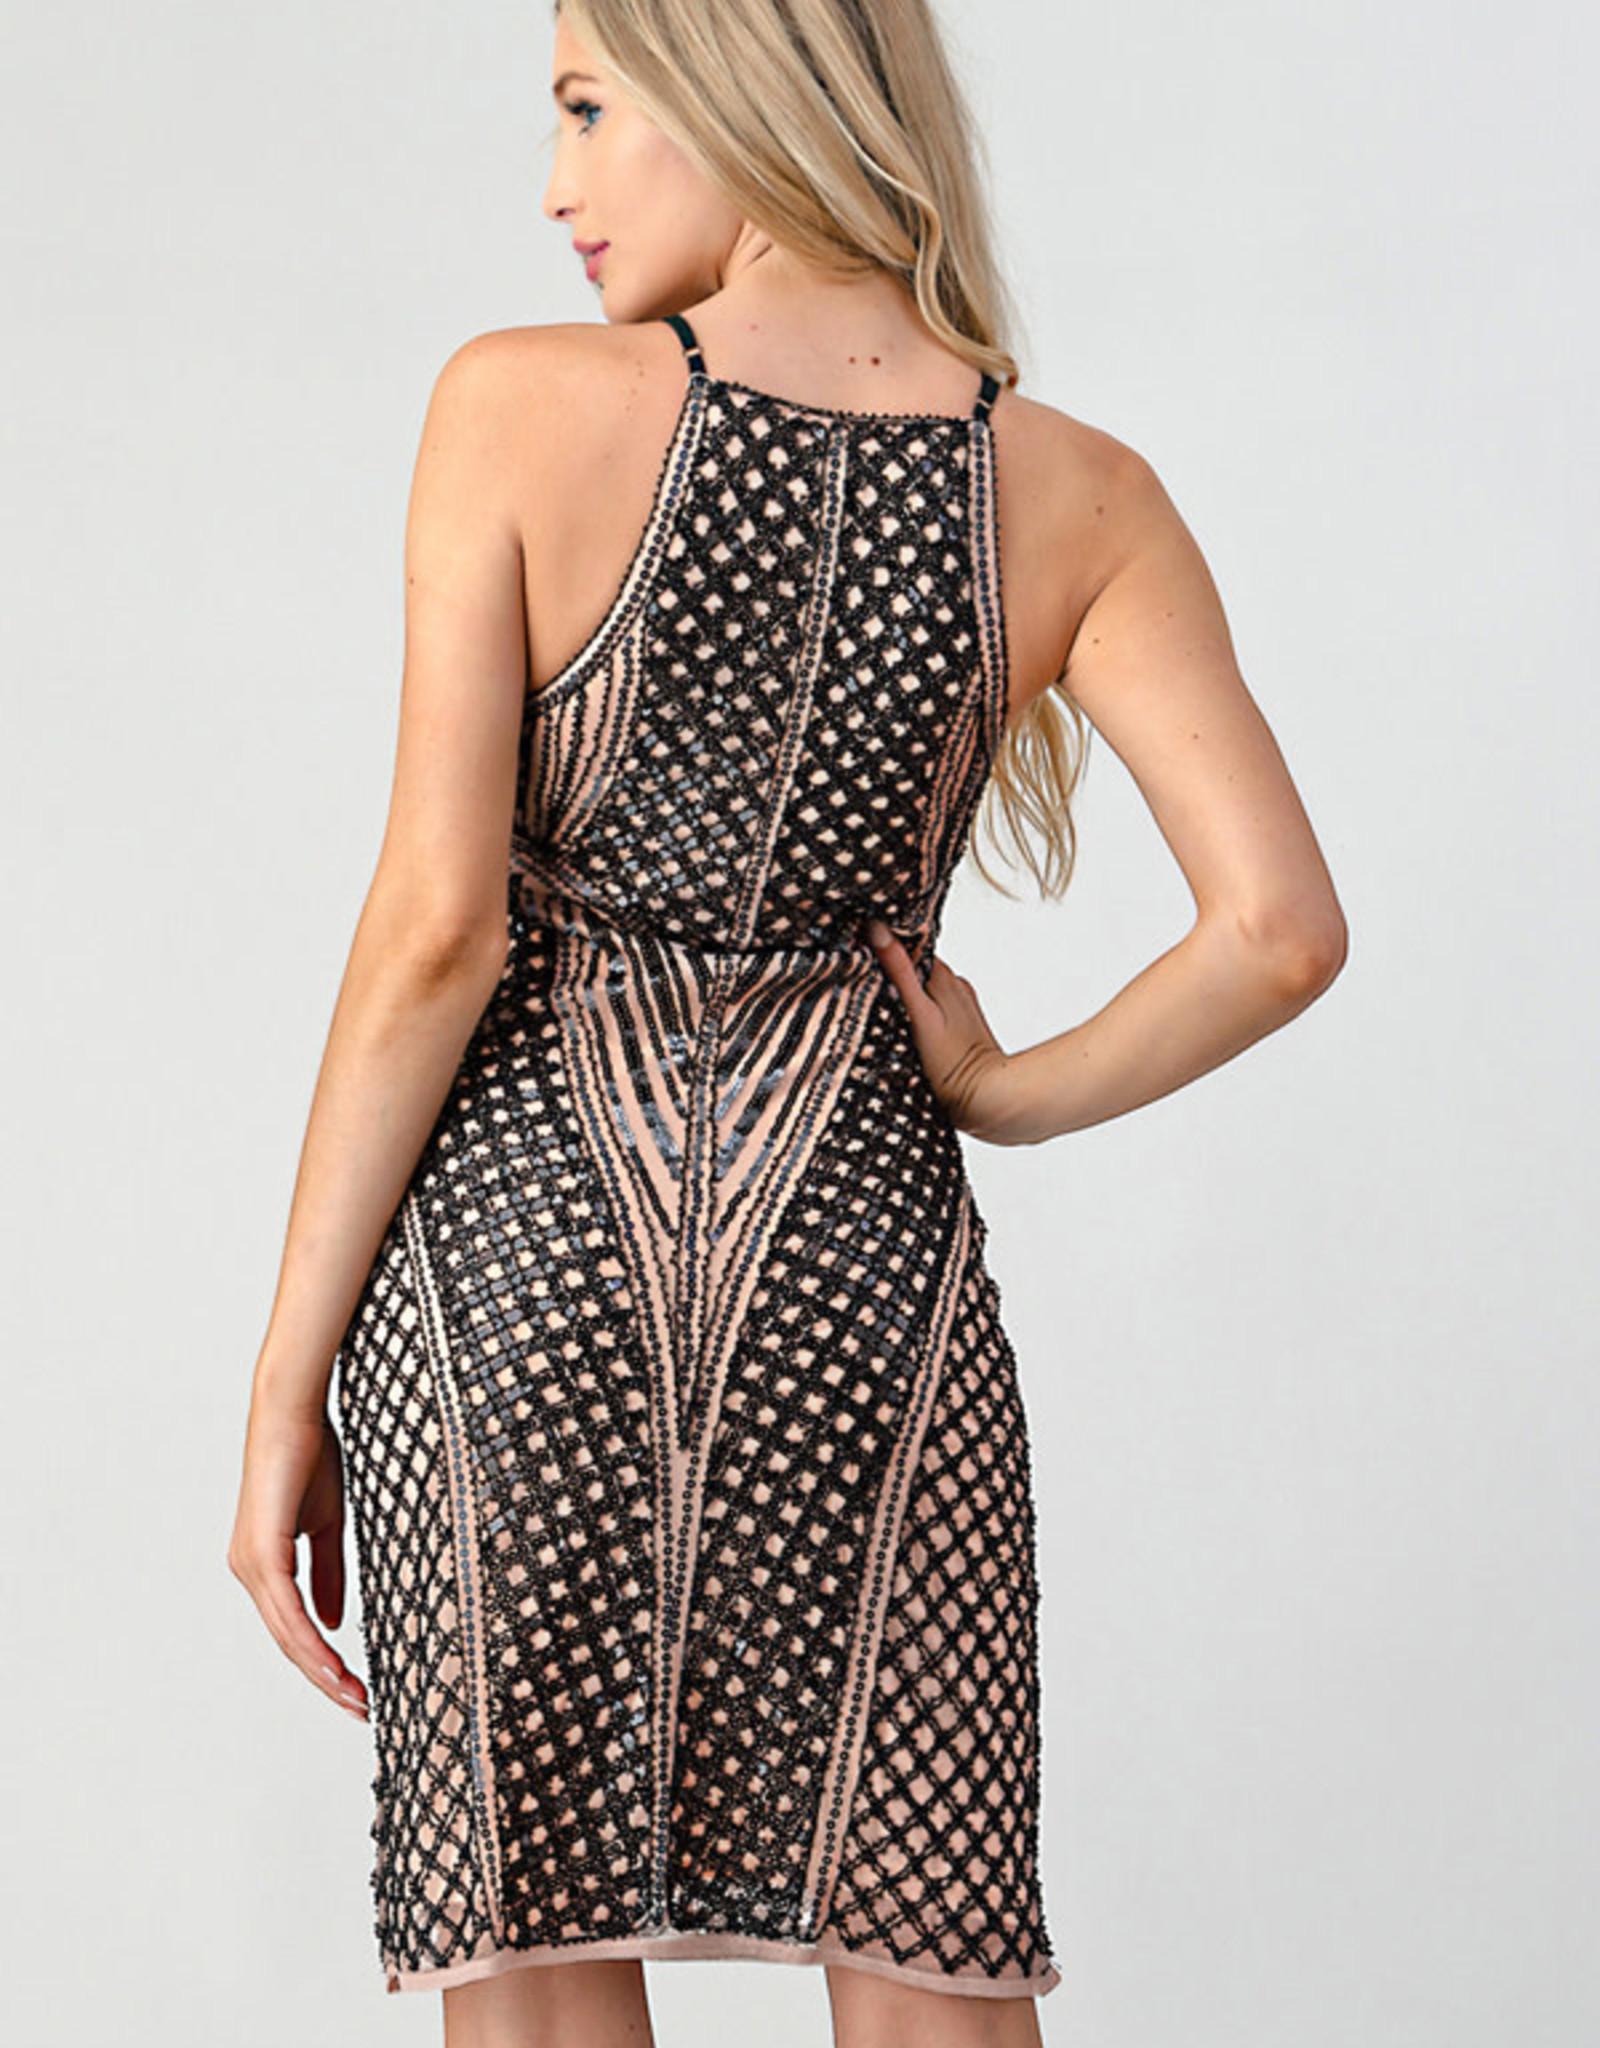 Nude/Black Dress